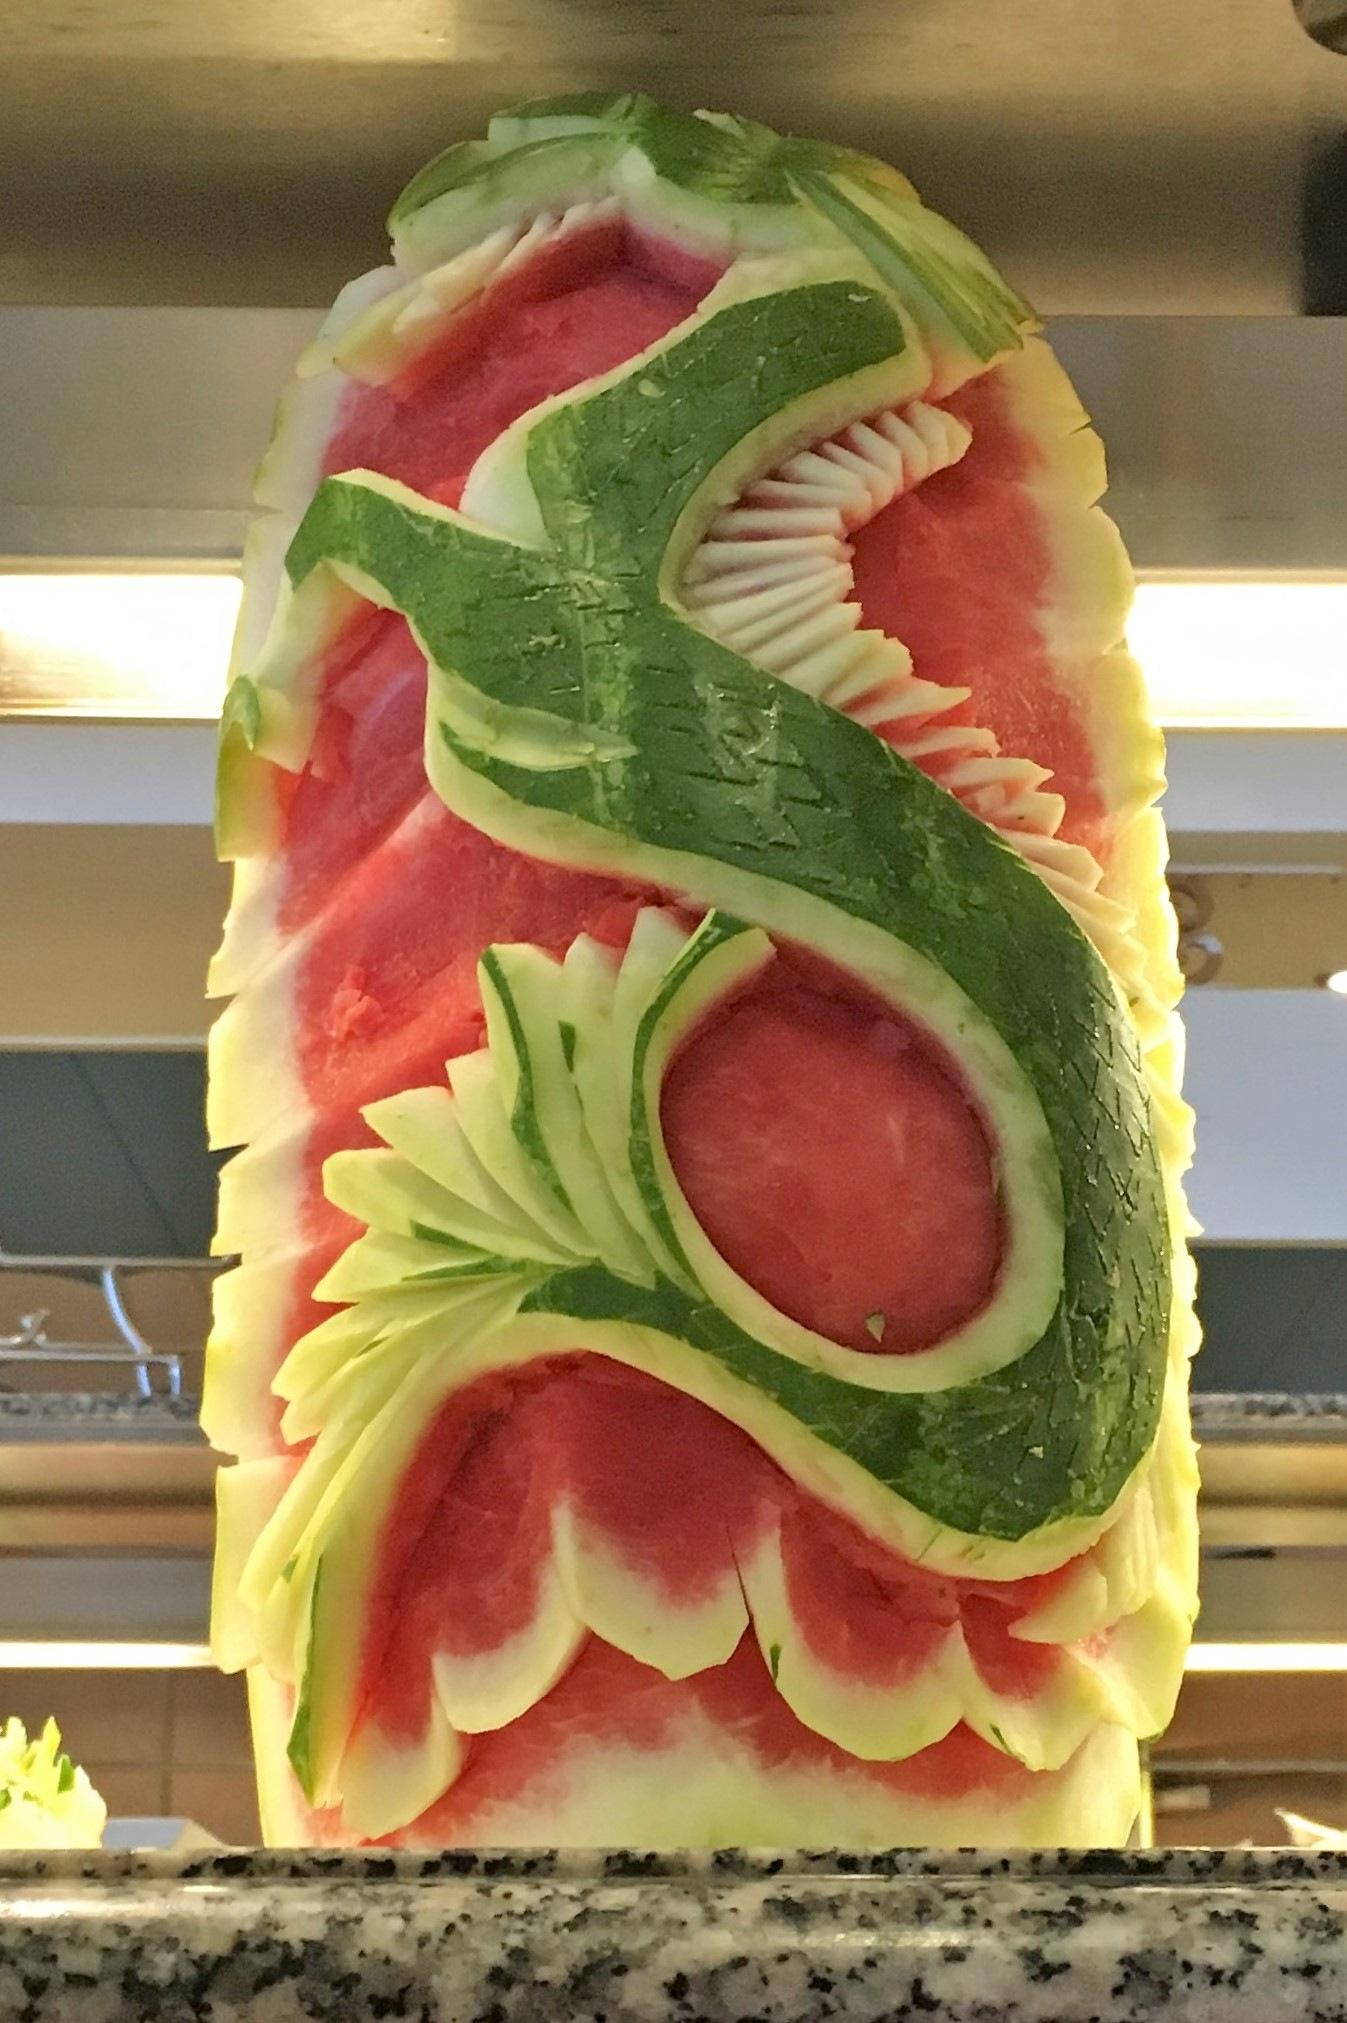 Watermelon Dragon by ronmac777